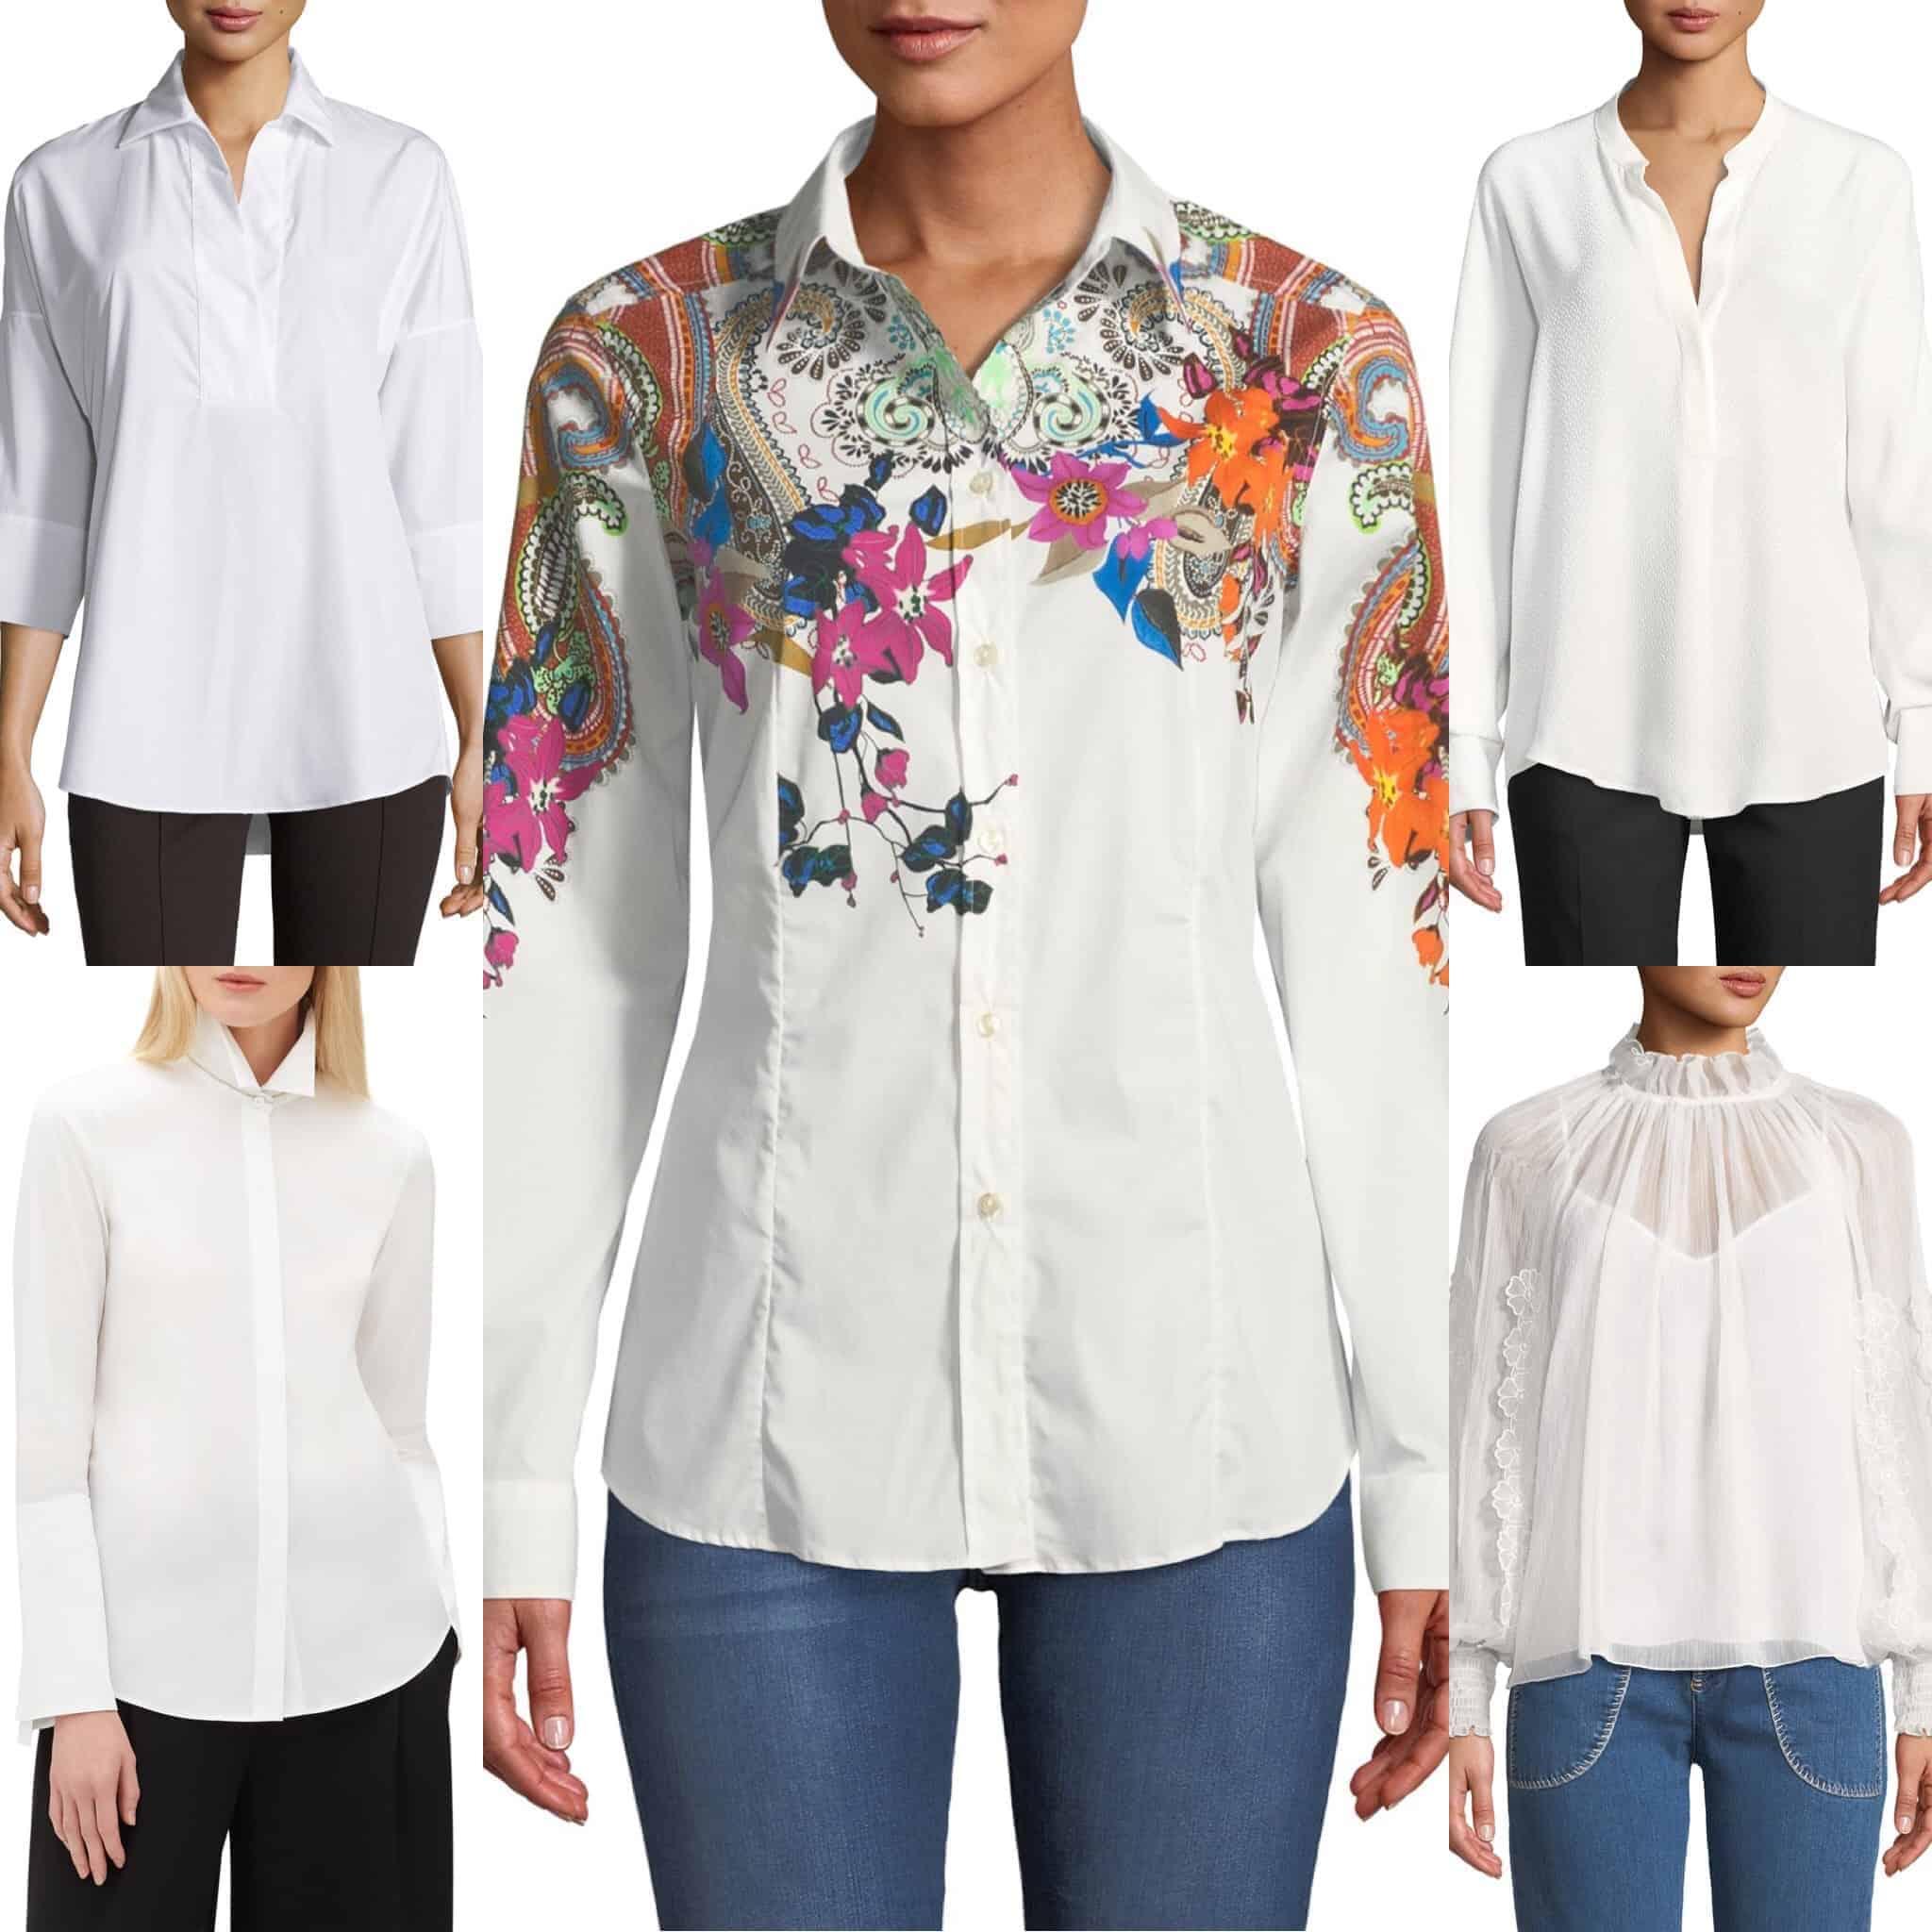 five panel display of models wearing women's white shirts